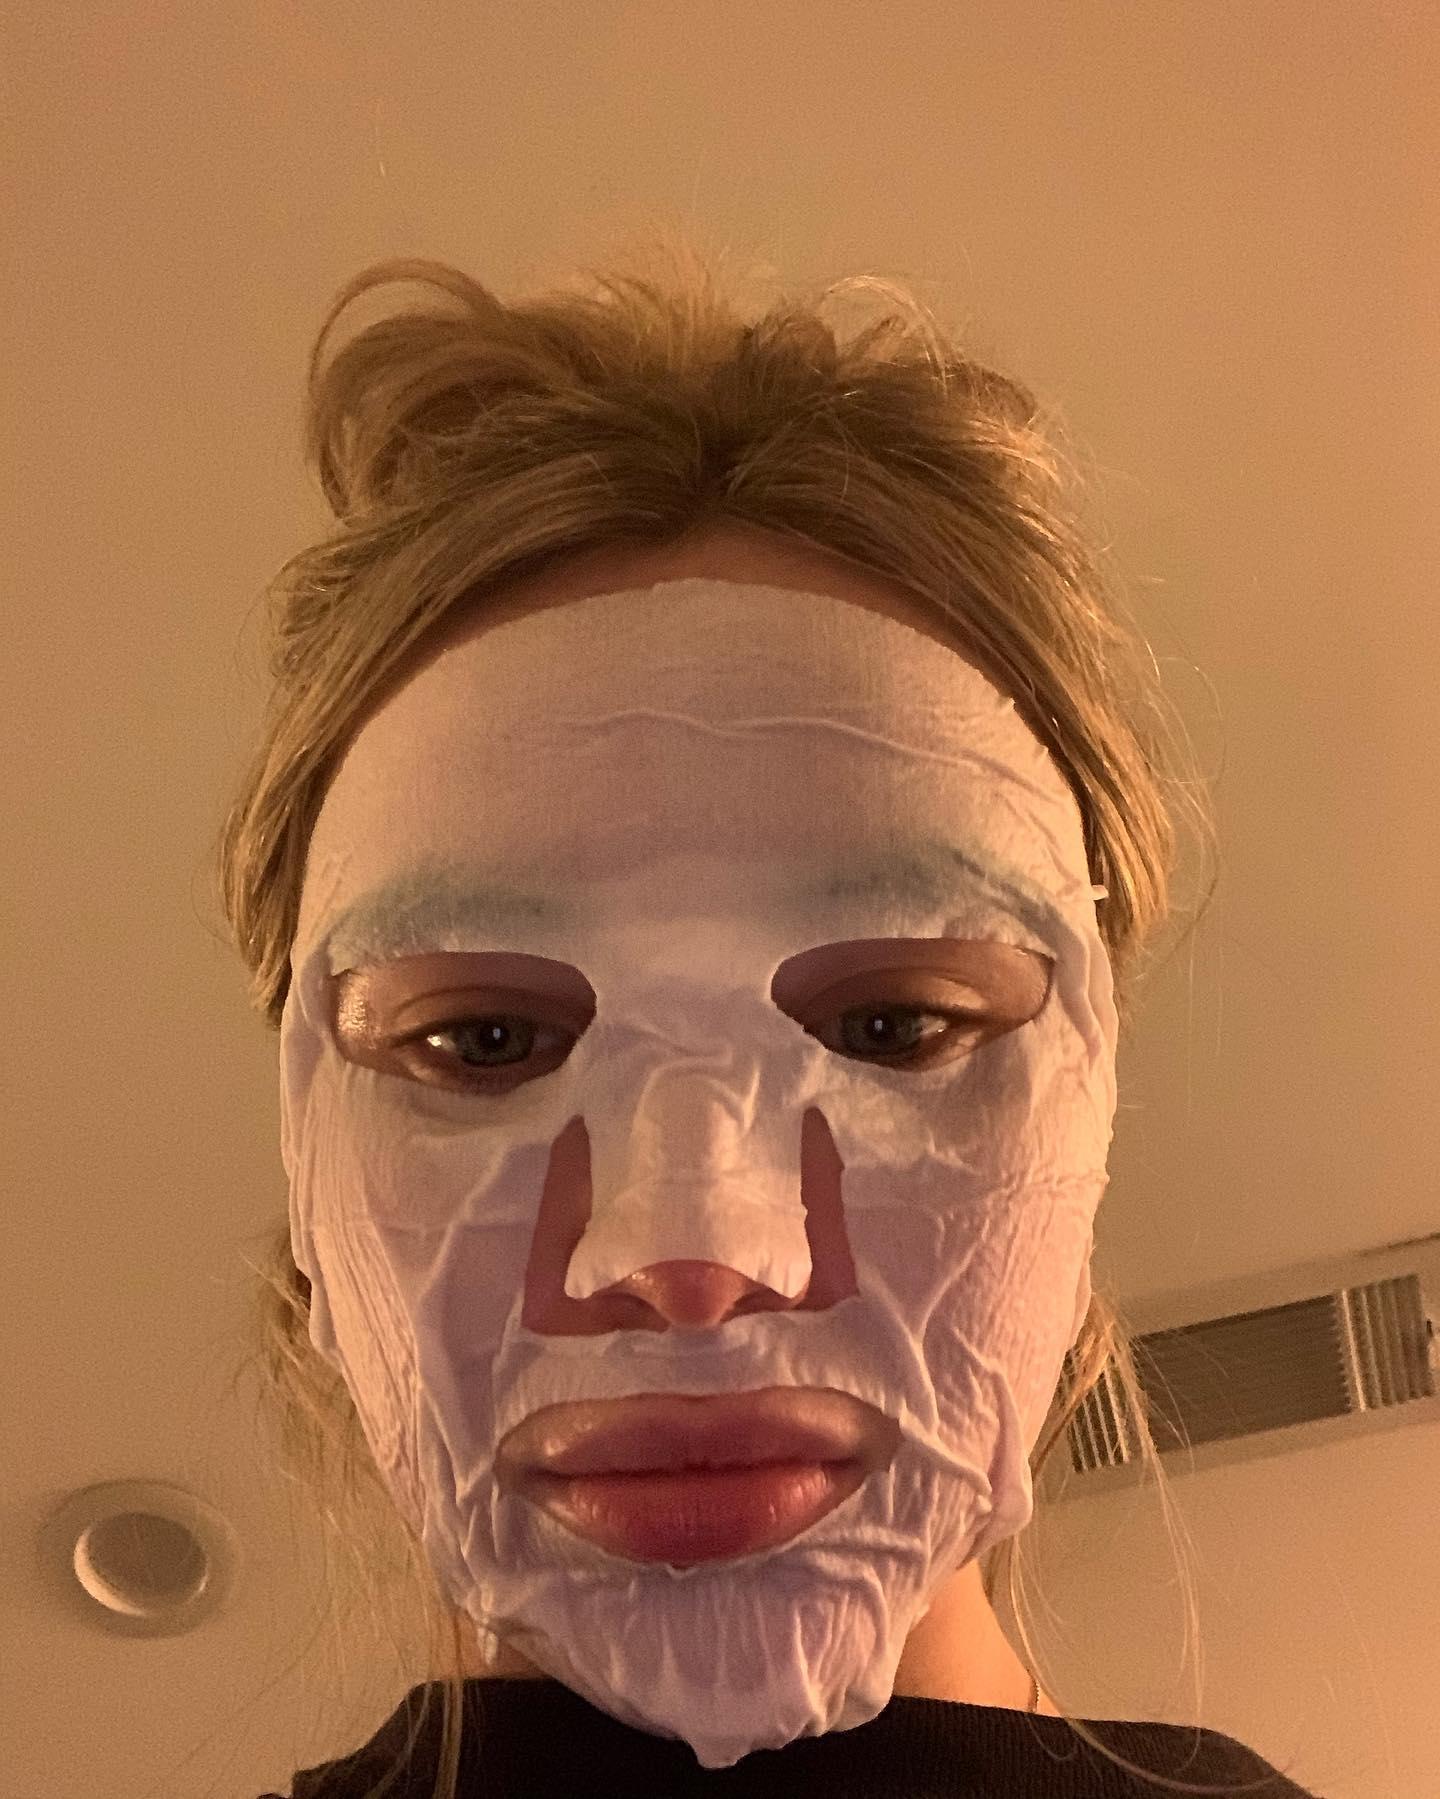 Sabrina Carpenter 2021 : Sabrina Carpenter – Personal photos-01